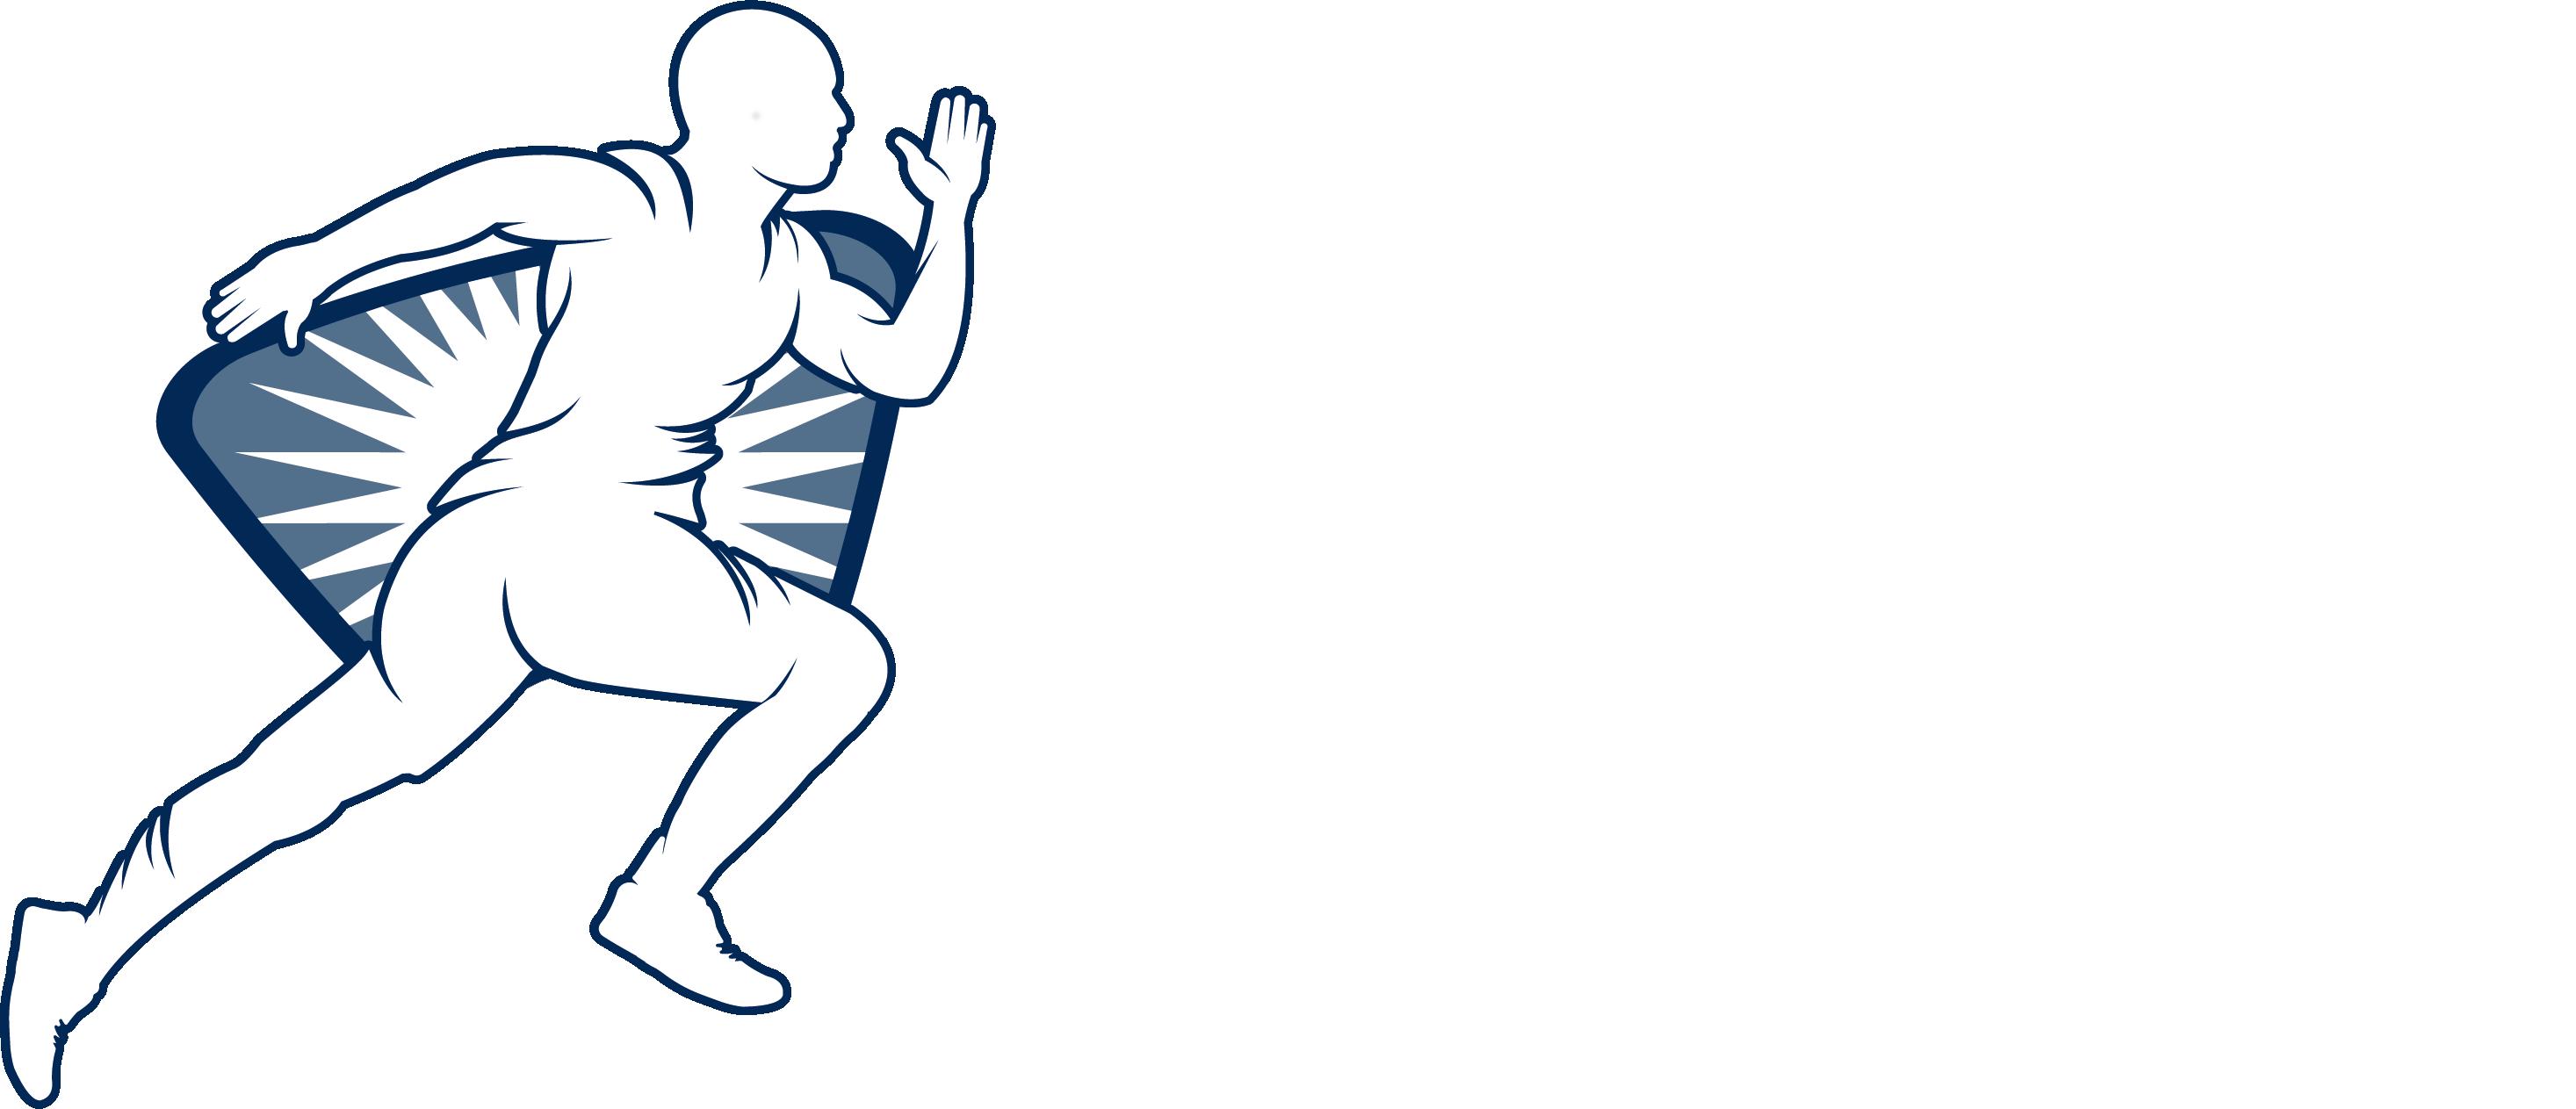 SuperTrening